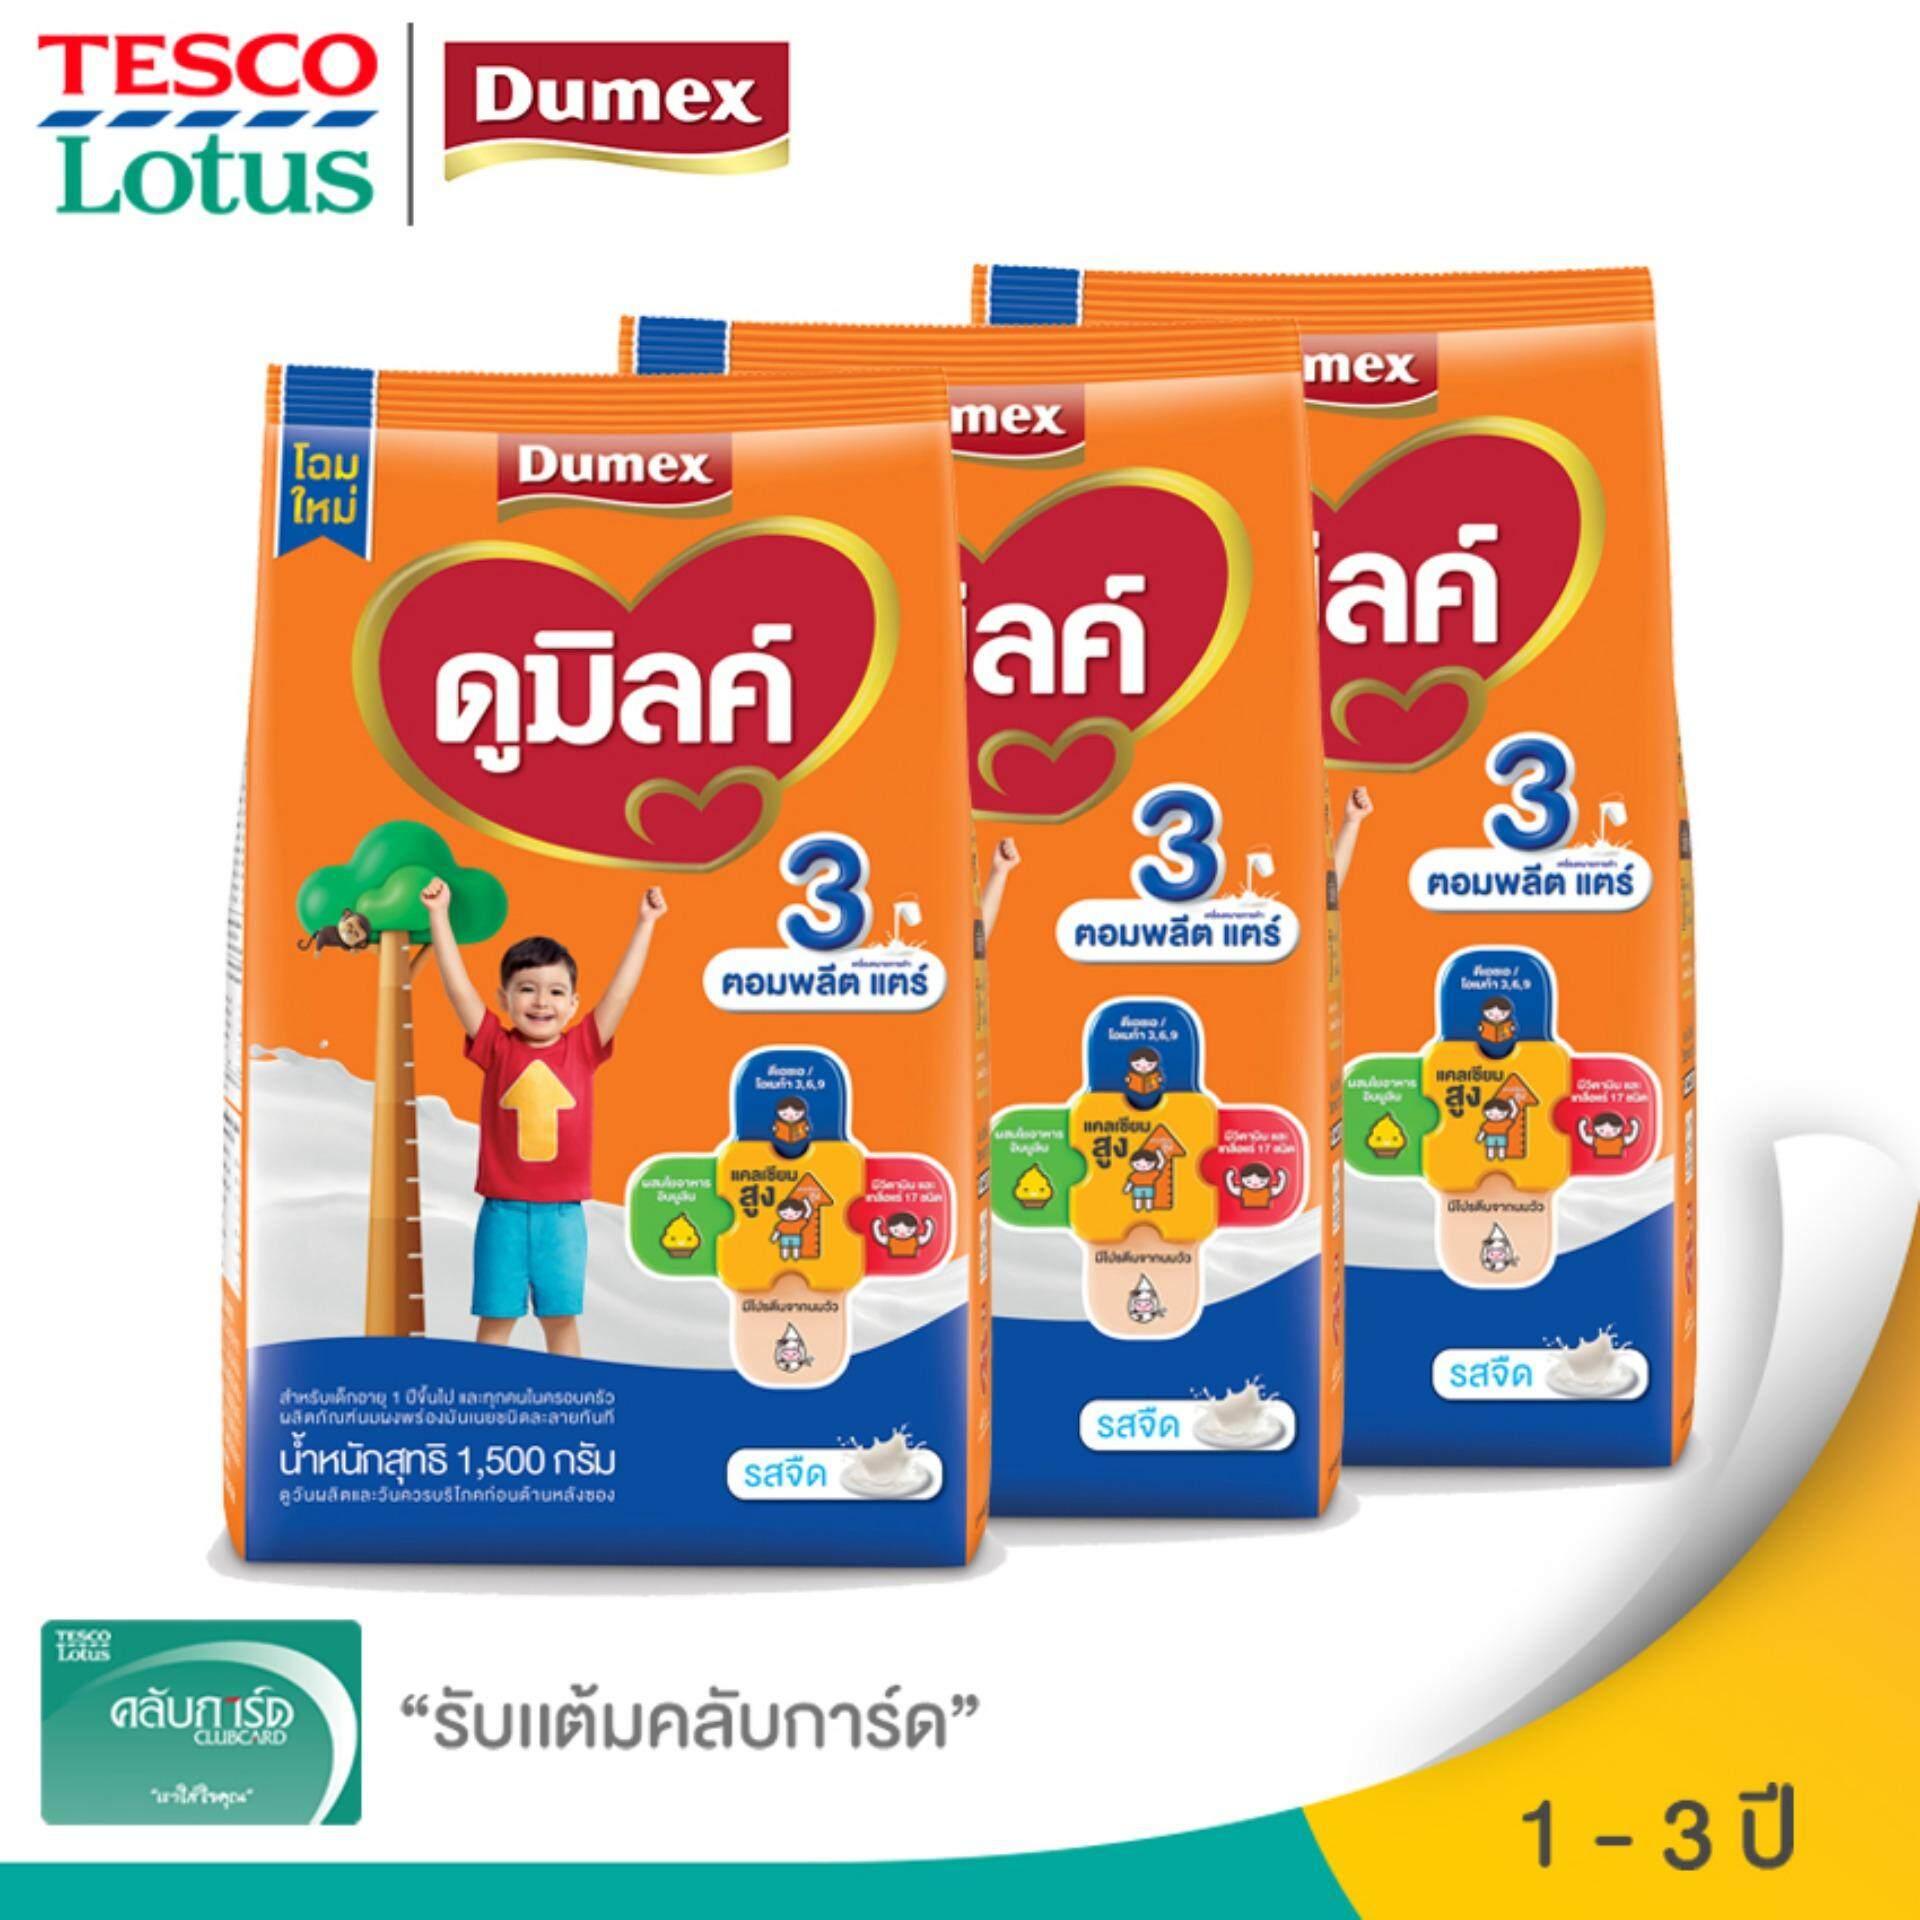 Dumex ดูเม็กซ์ นมผงสำหรับเด็ก ช่วงวัยที่ 3 ดูมิลค์ ฅอมพลีตแฅร์ รสจืด 1500 กรัม (แพ็ค 3 ถุง) By Tesco Lotus.